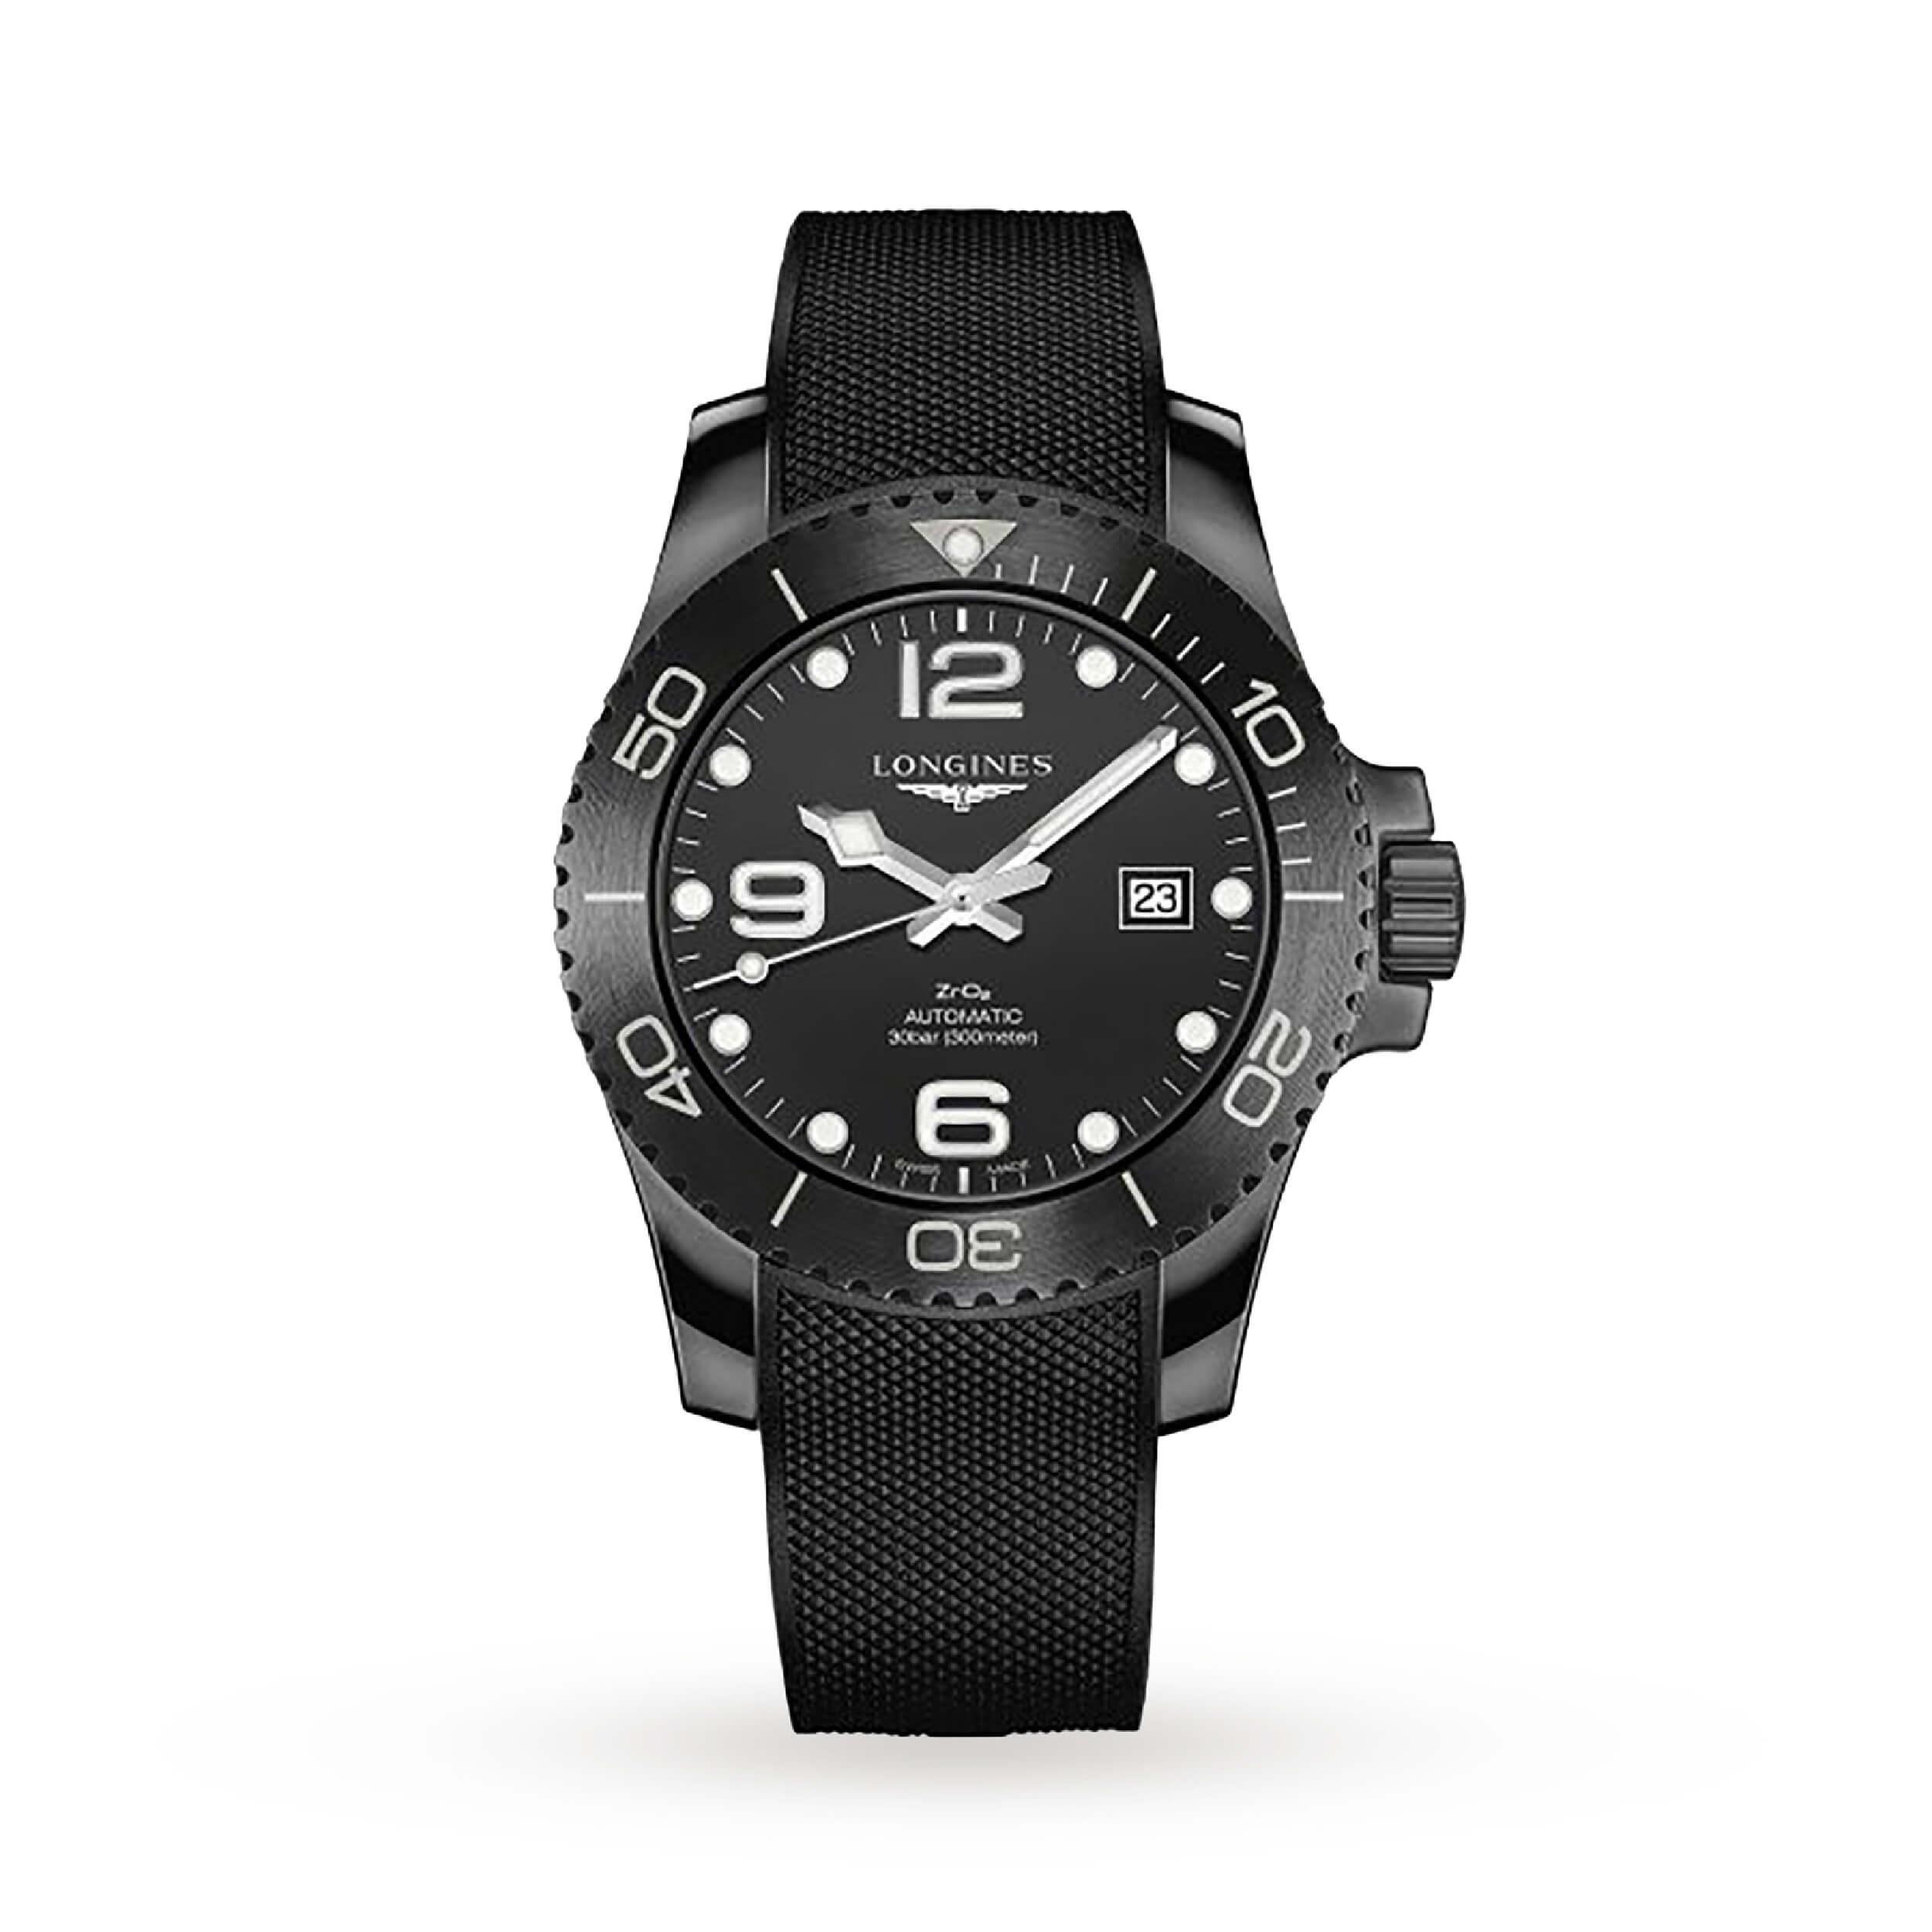 Longines Hydroconquest | Wristwatches360